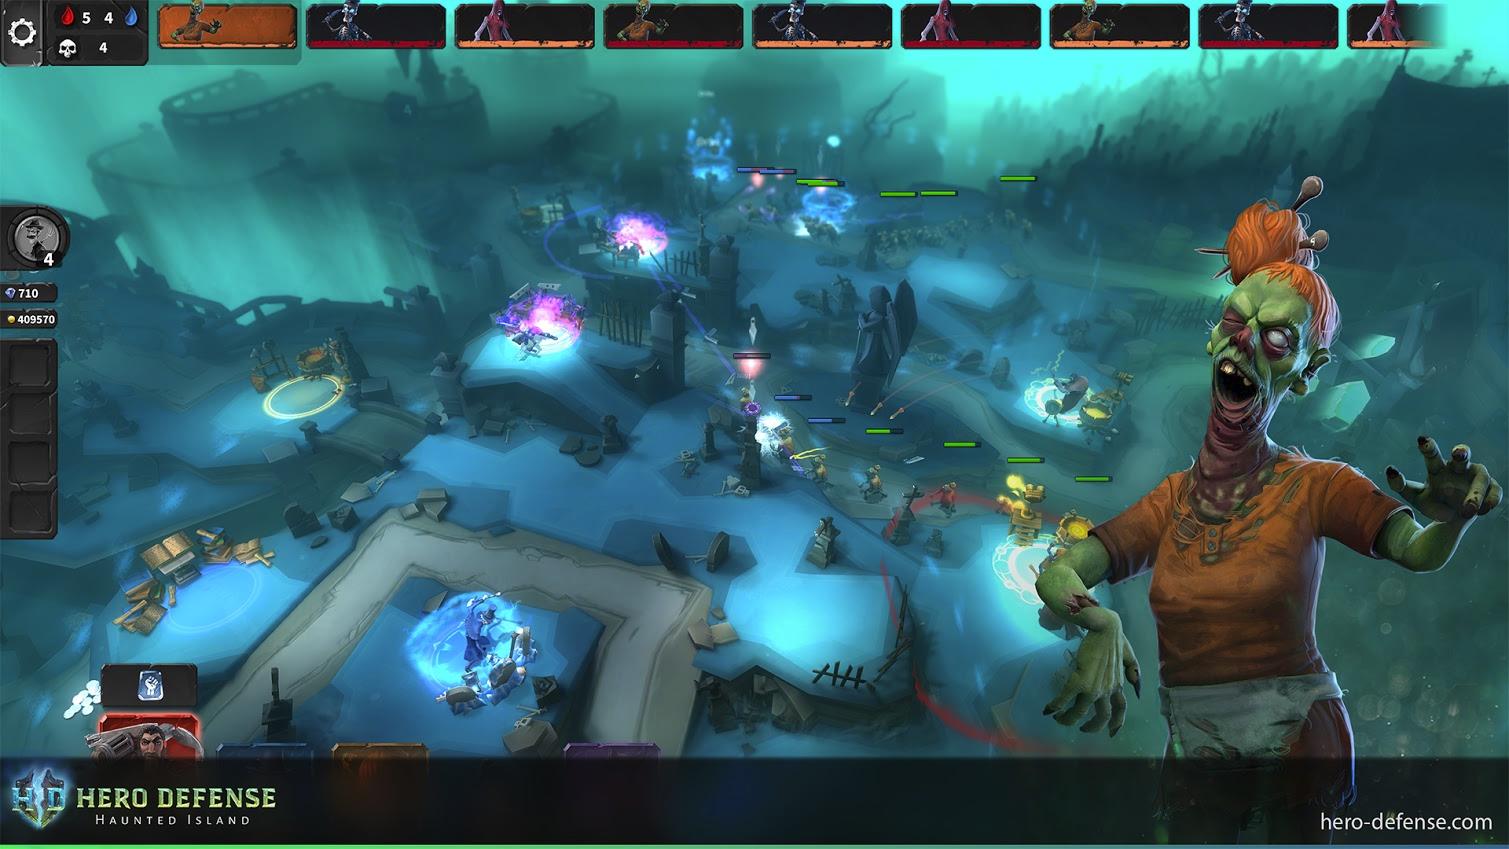 Hero Defense - Haunted Island Multiplayer Update Available